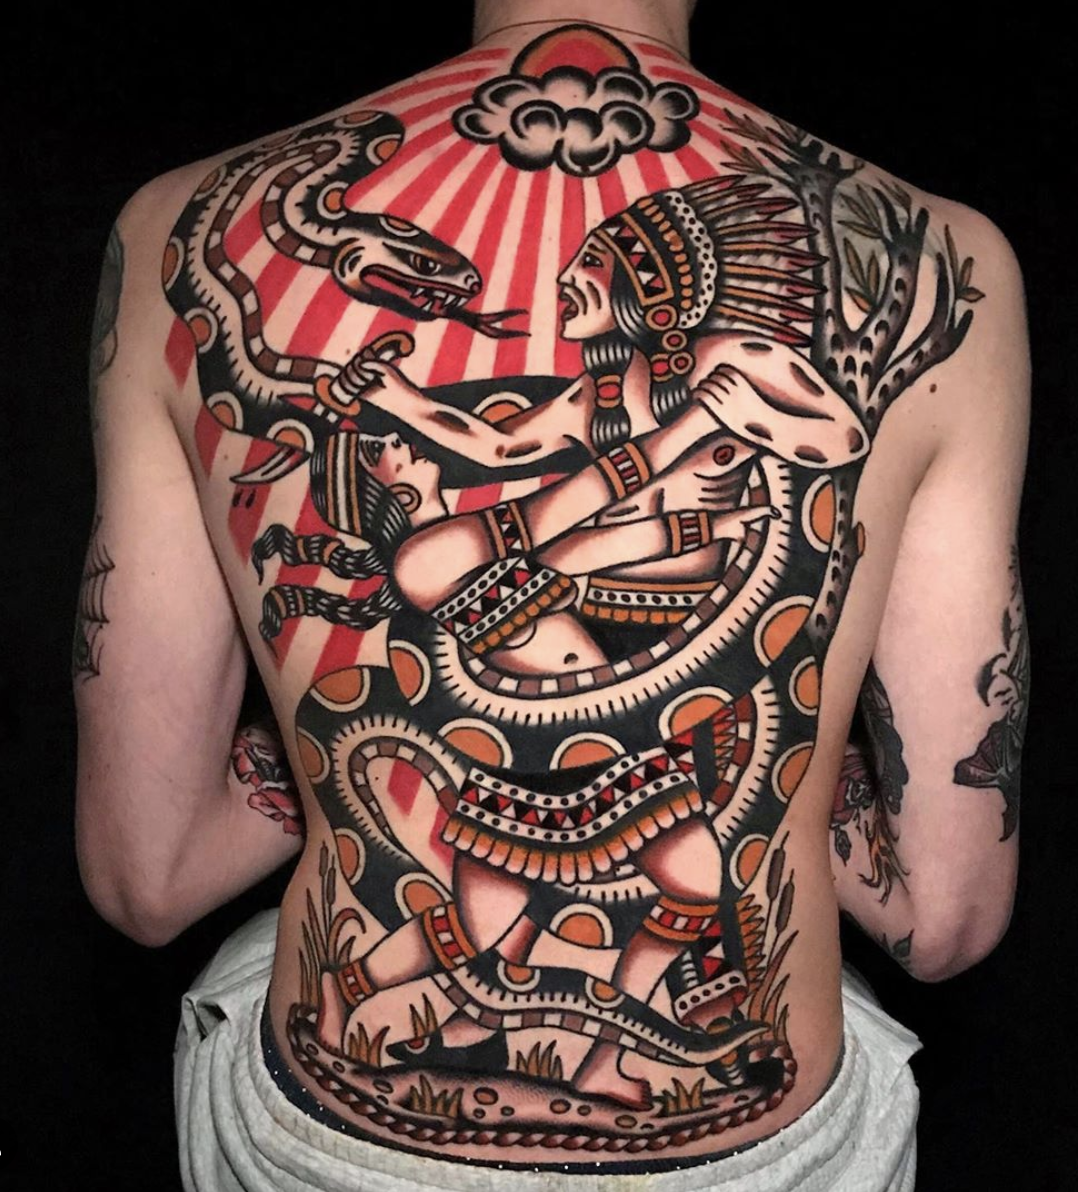 Francesco Ferarra guest spot berlin tattoo